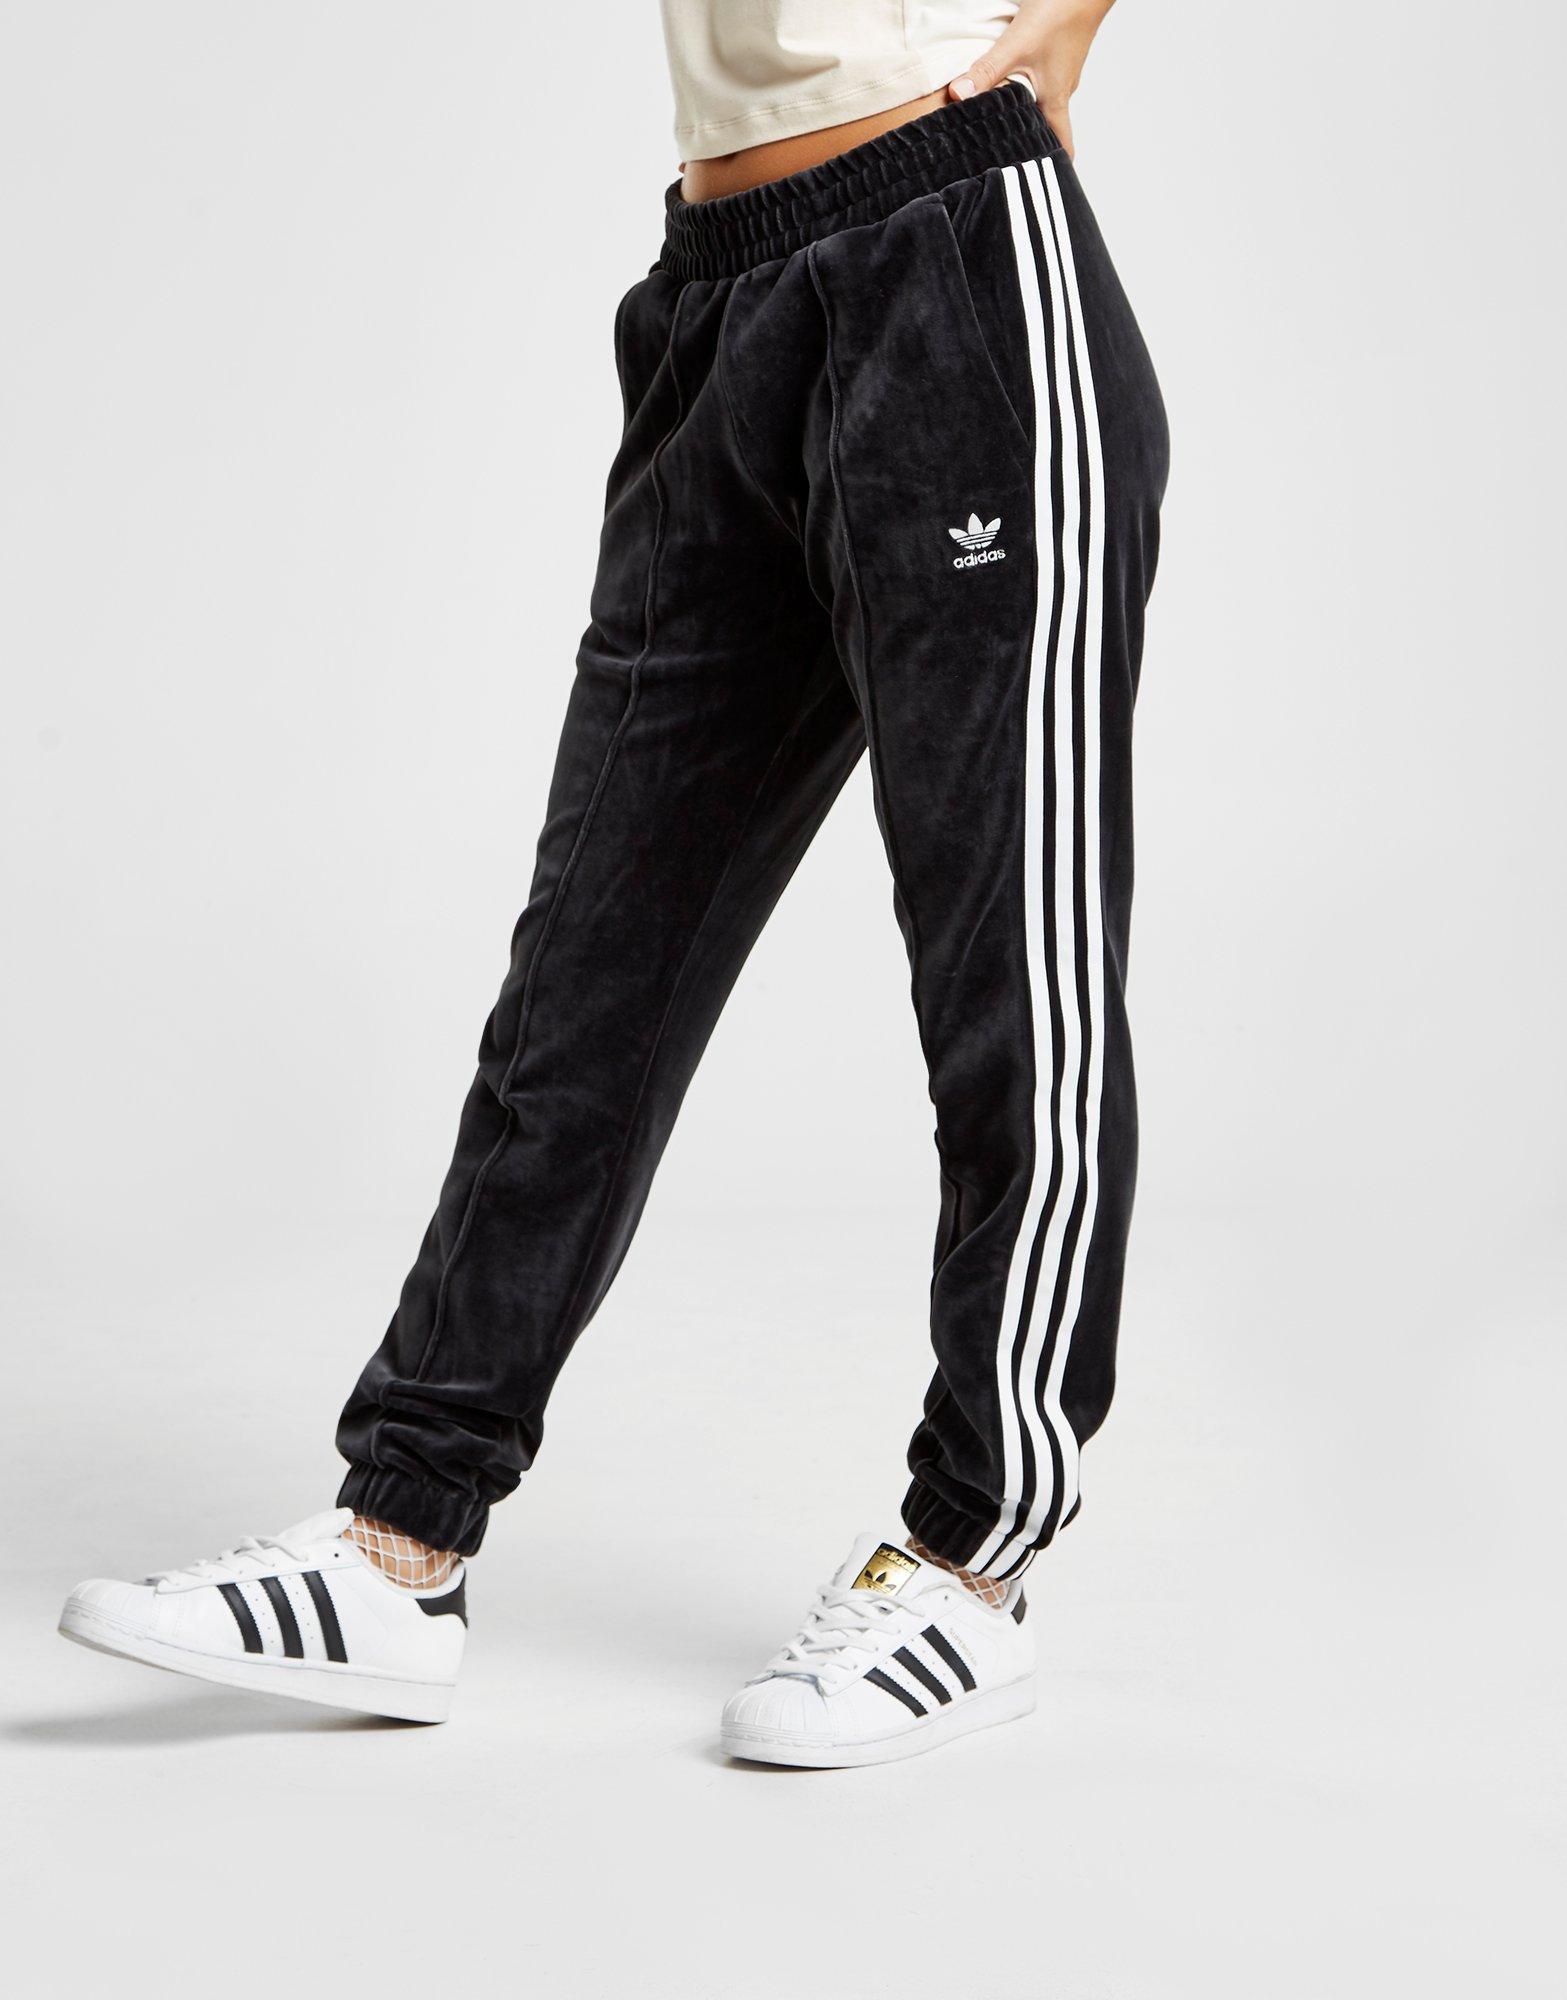 Velvet Black Track Stripes Adidas Originals 3 Pants shrQtd